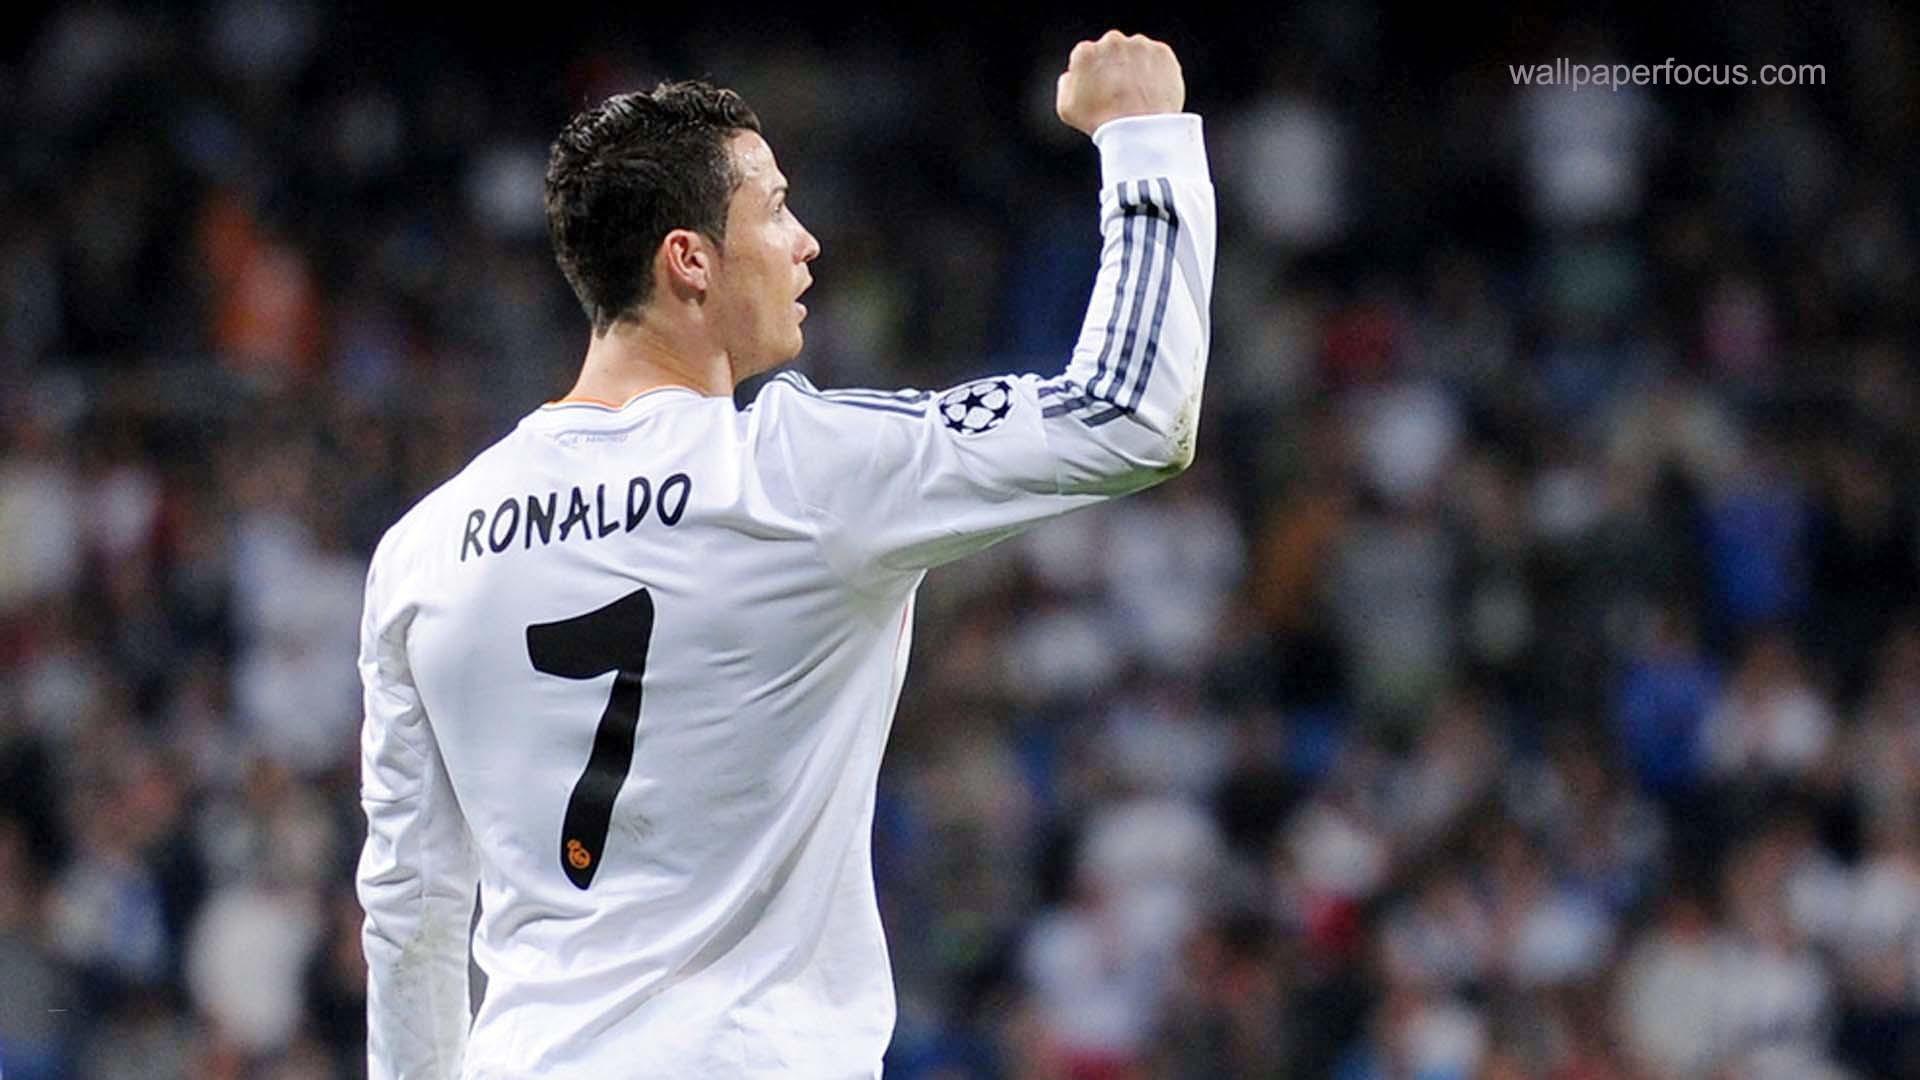 Ronaldo Full HD Wallpapers